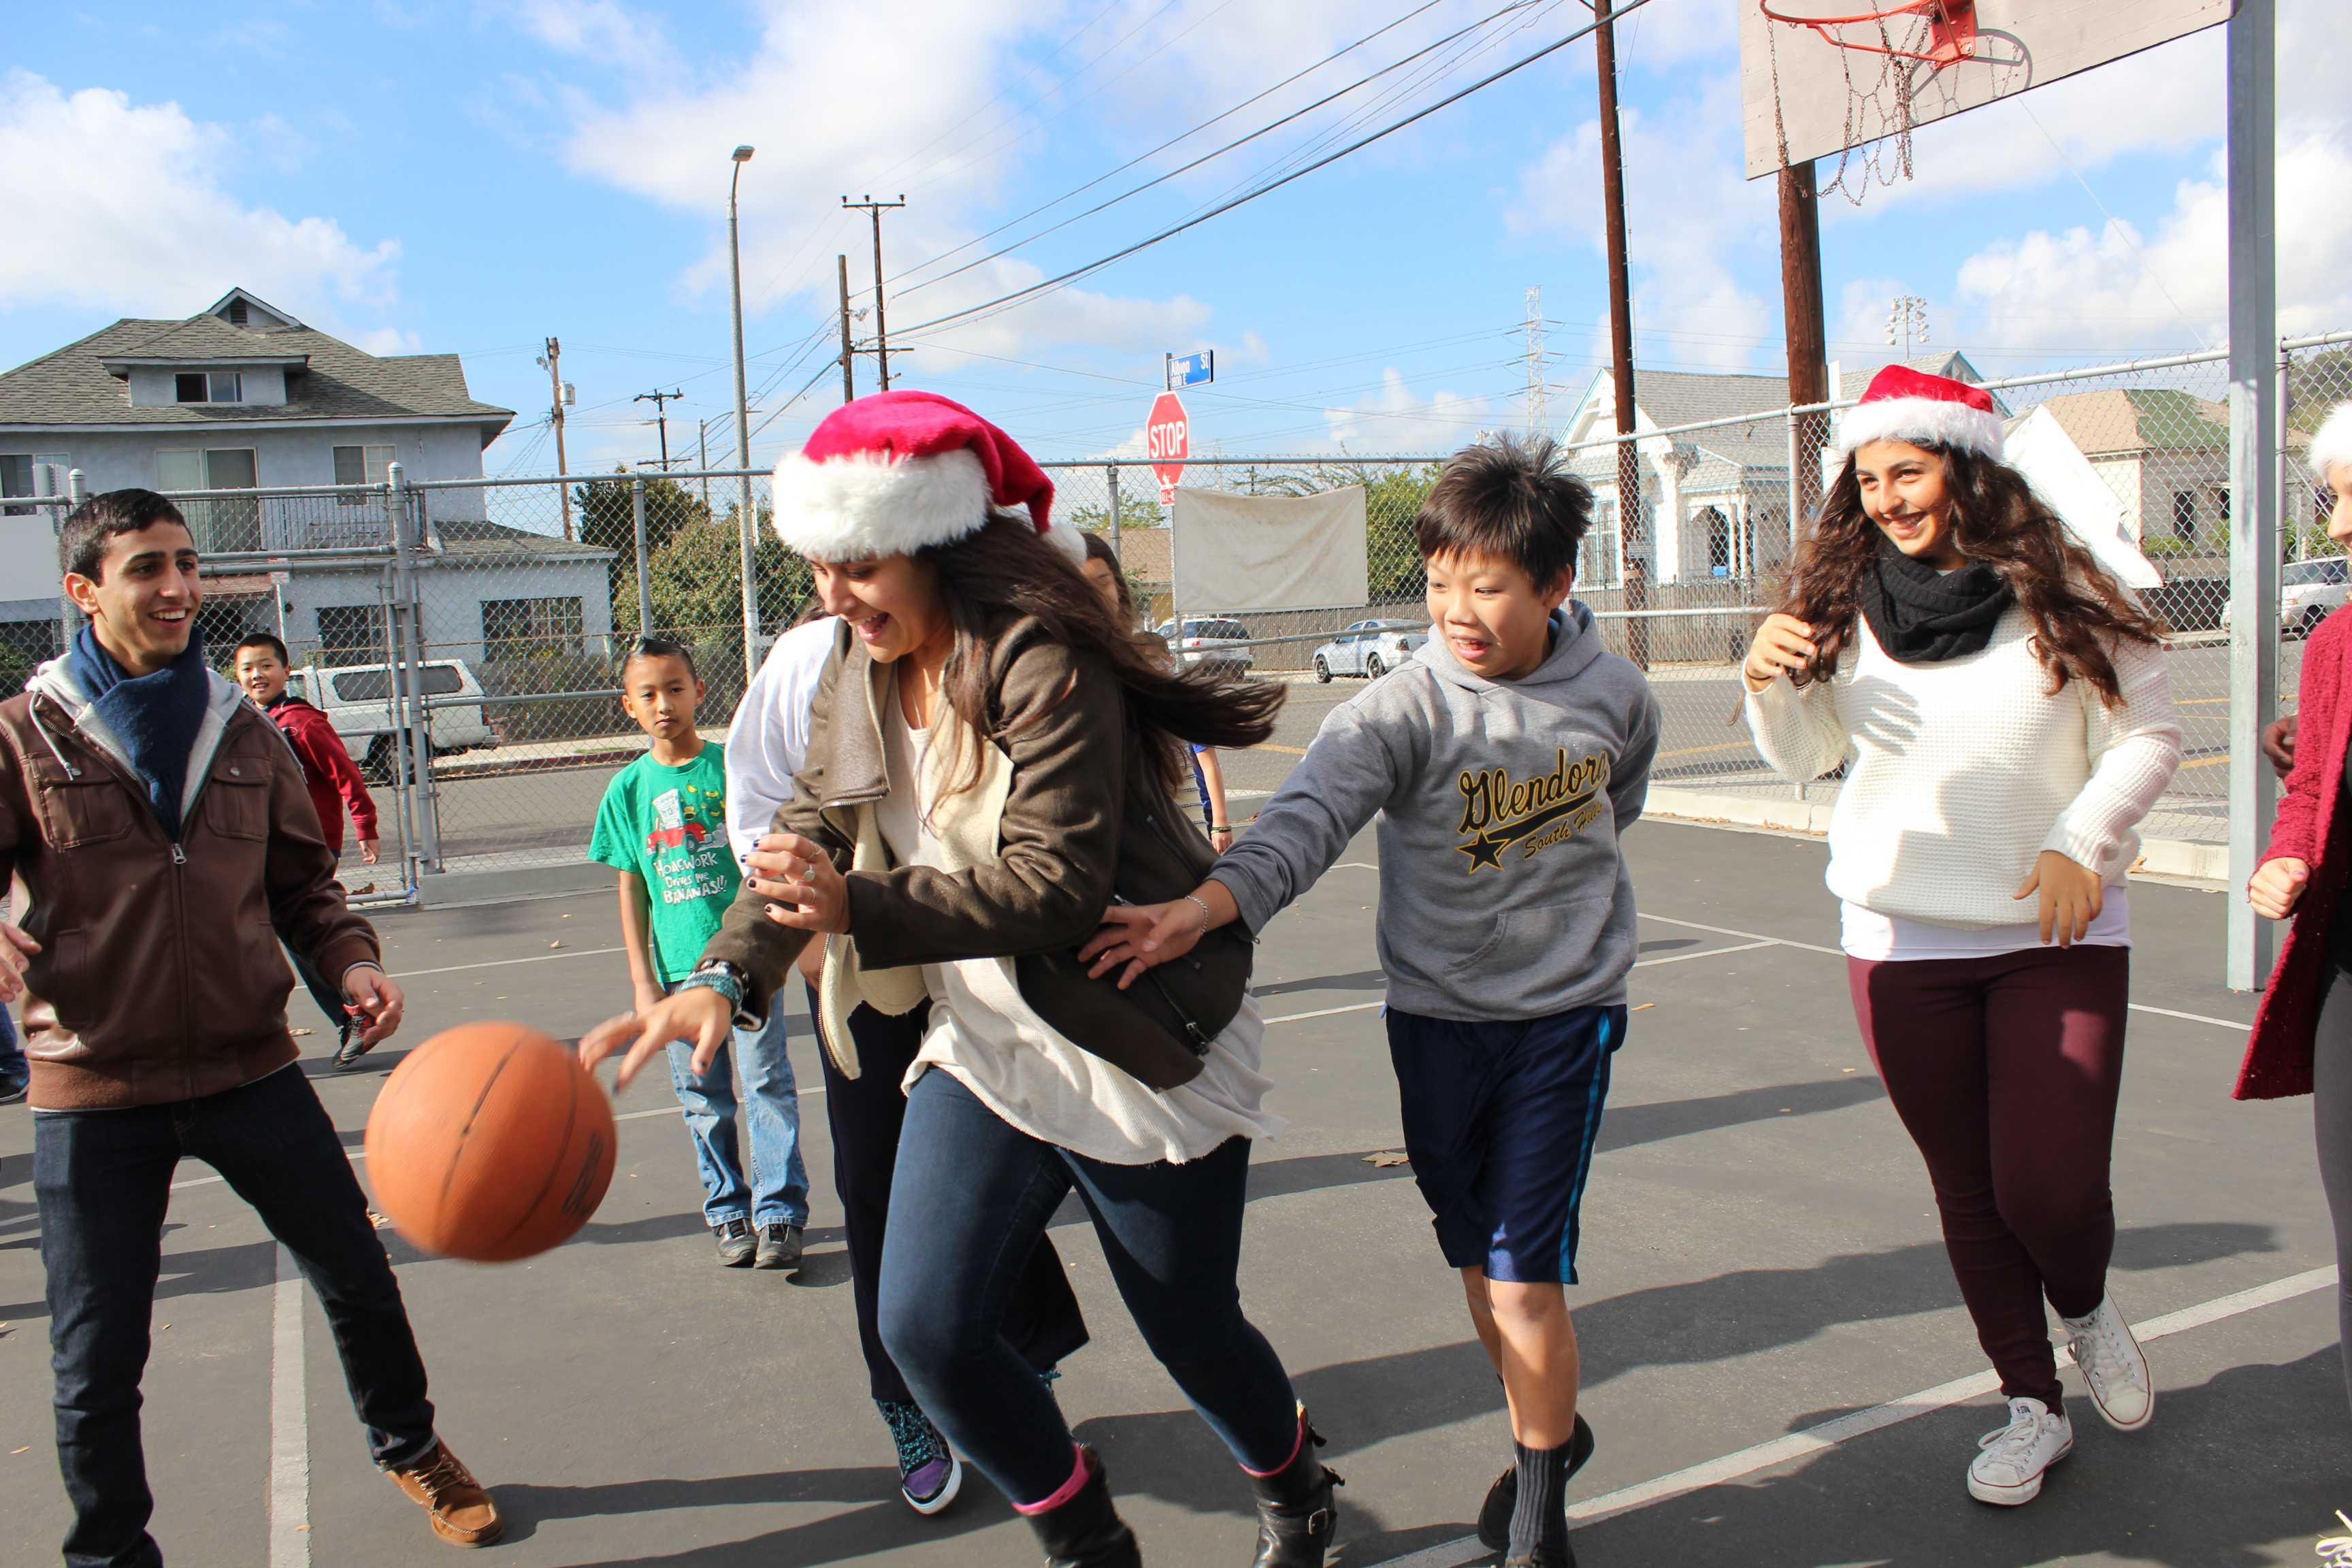 Seniors Alex Elgam, Matthew Ghermezi and Shana Kahrobaee play basketball with Albion students during recess.